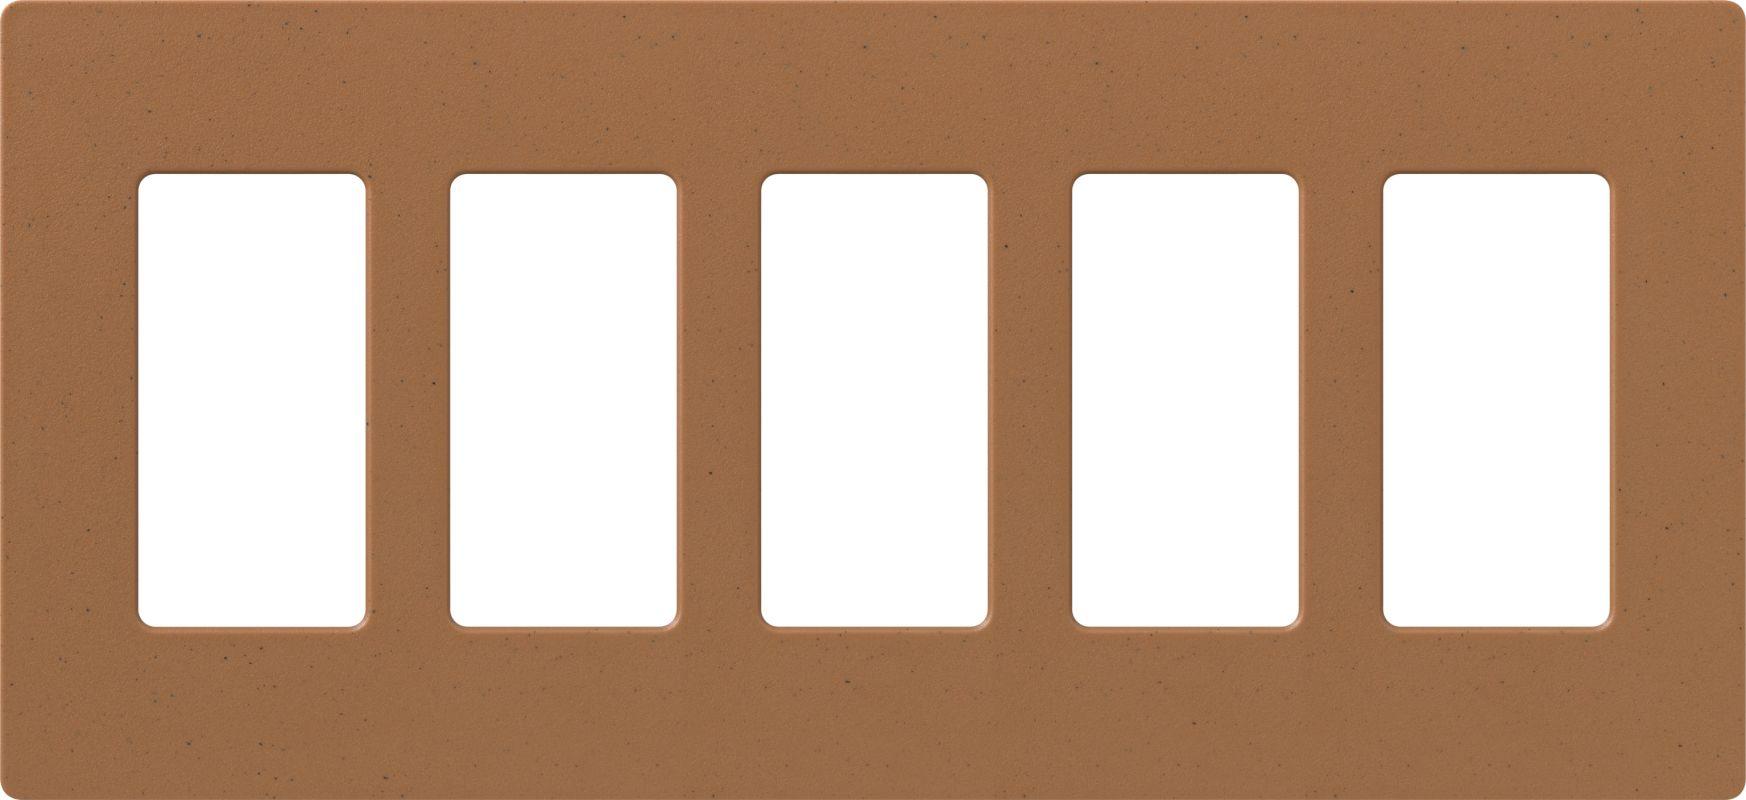 Lutron CW-5 Claro Five Gang Designer Wall Plate Terracotta Wall